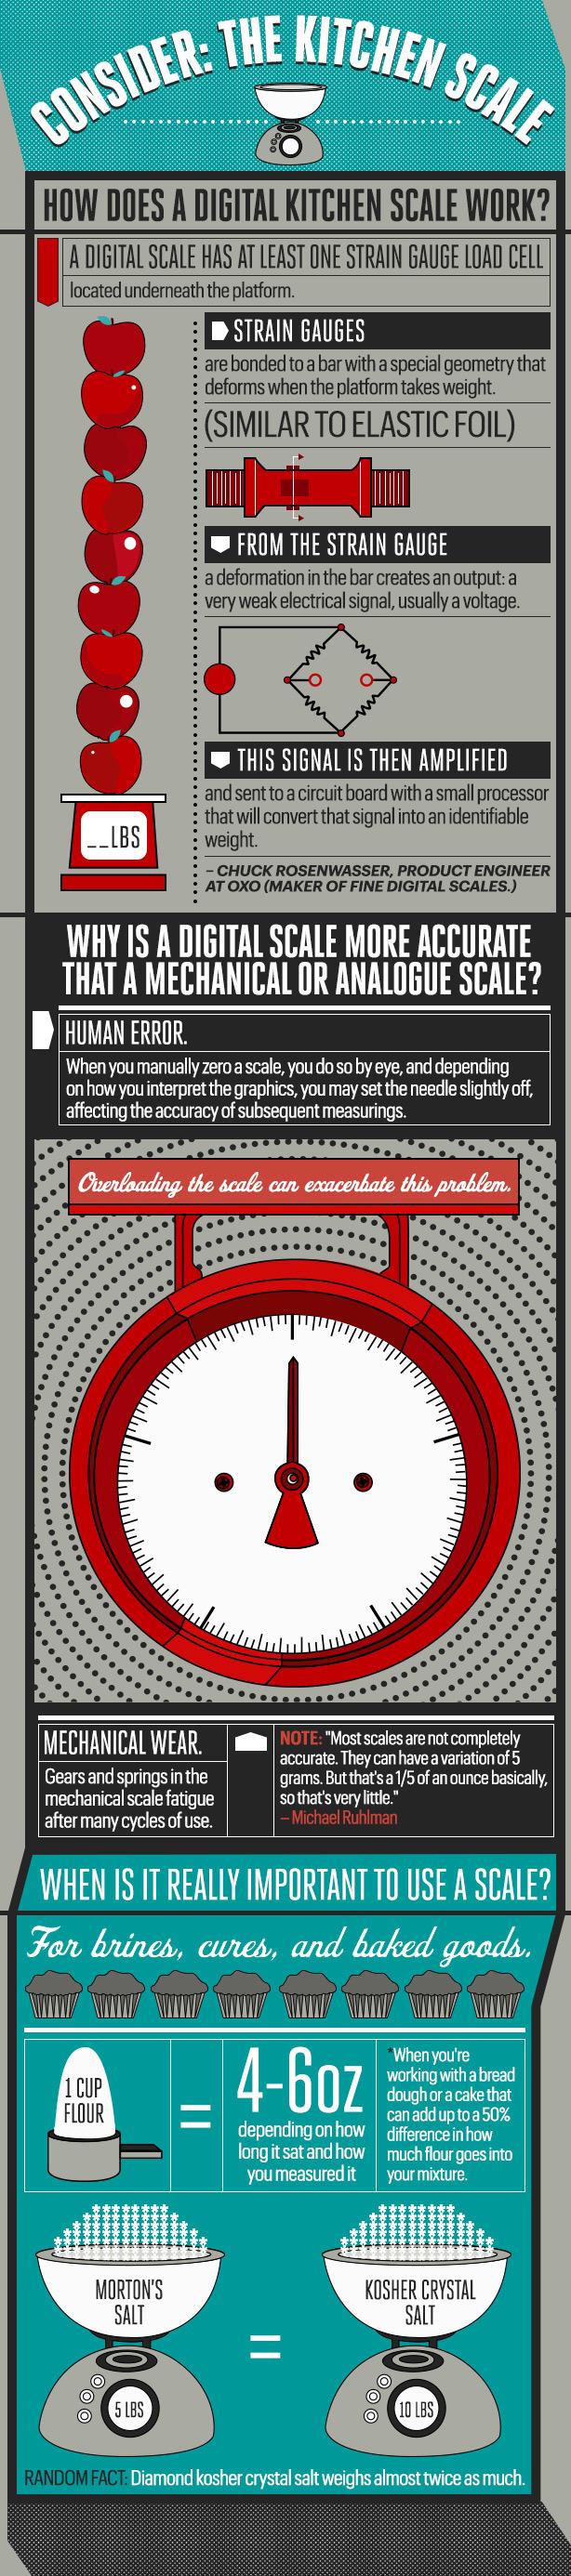 kitchen-scale-infographic.jpg